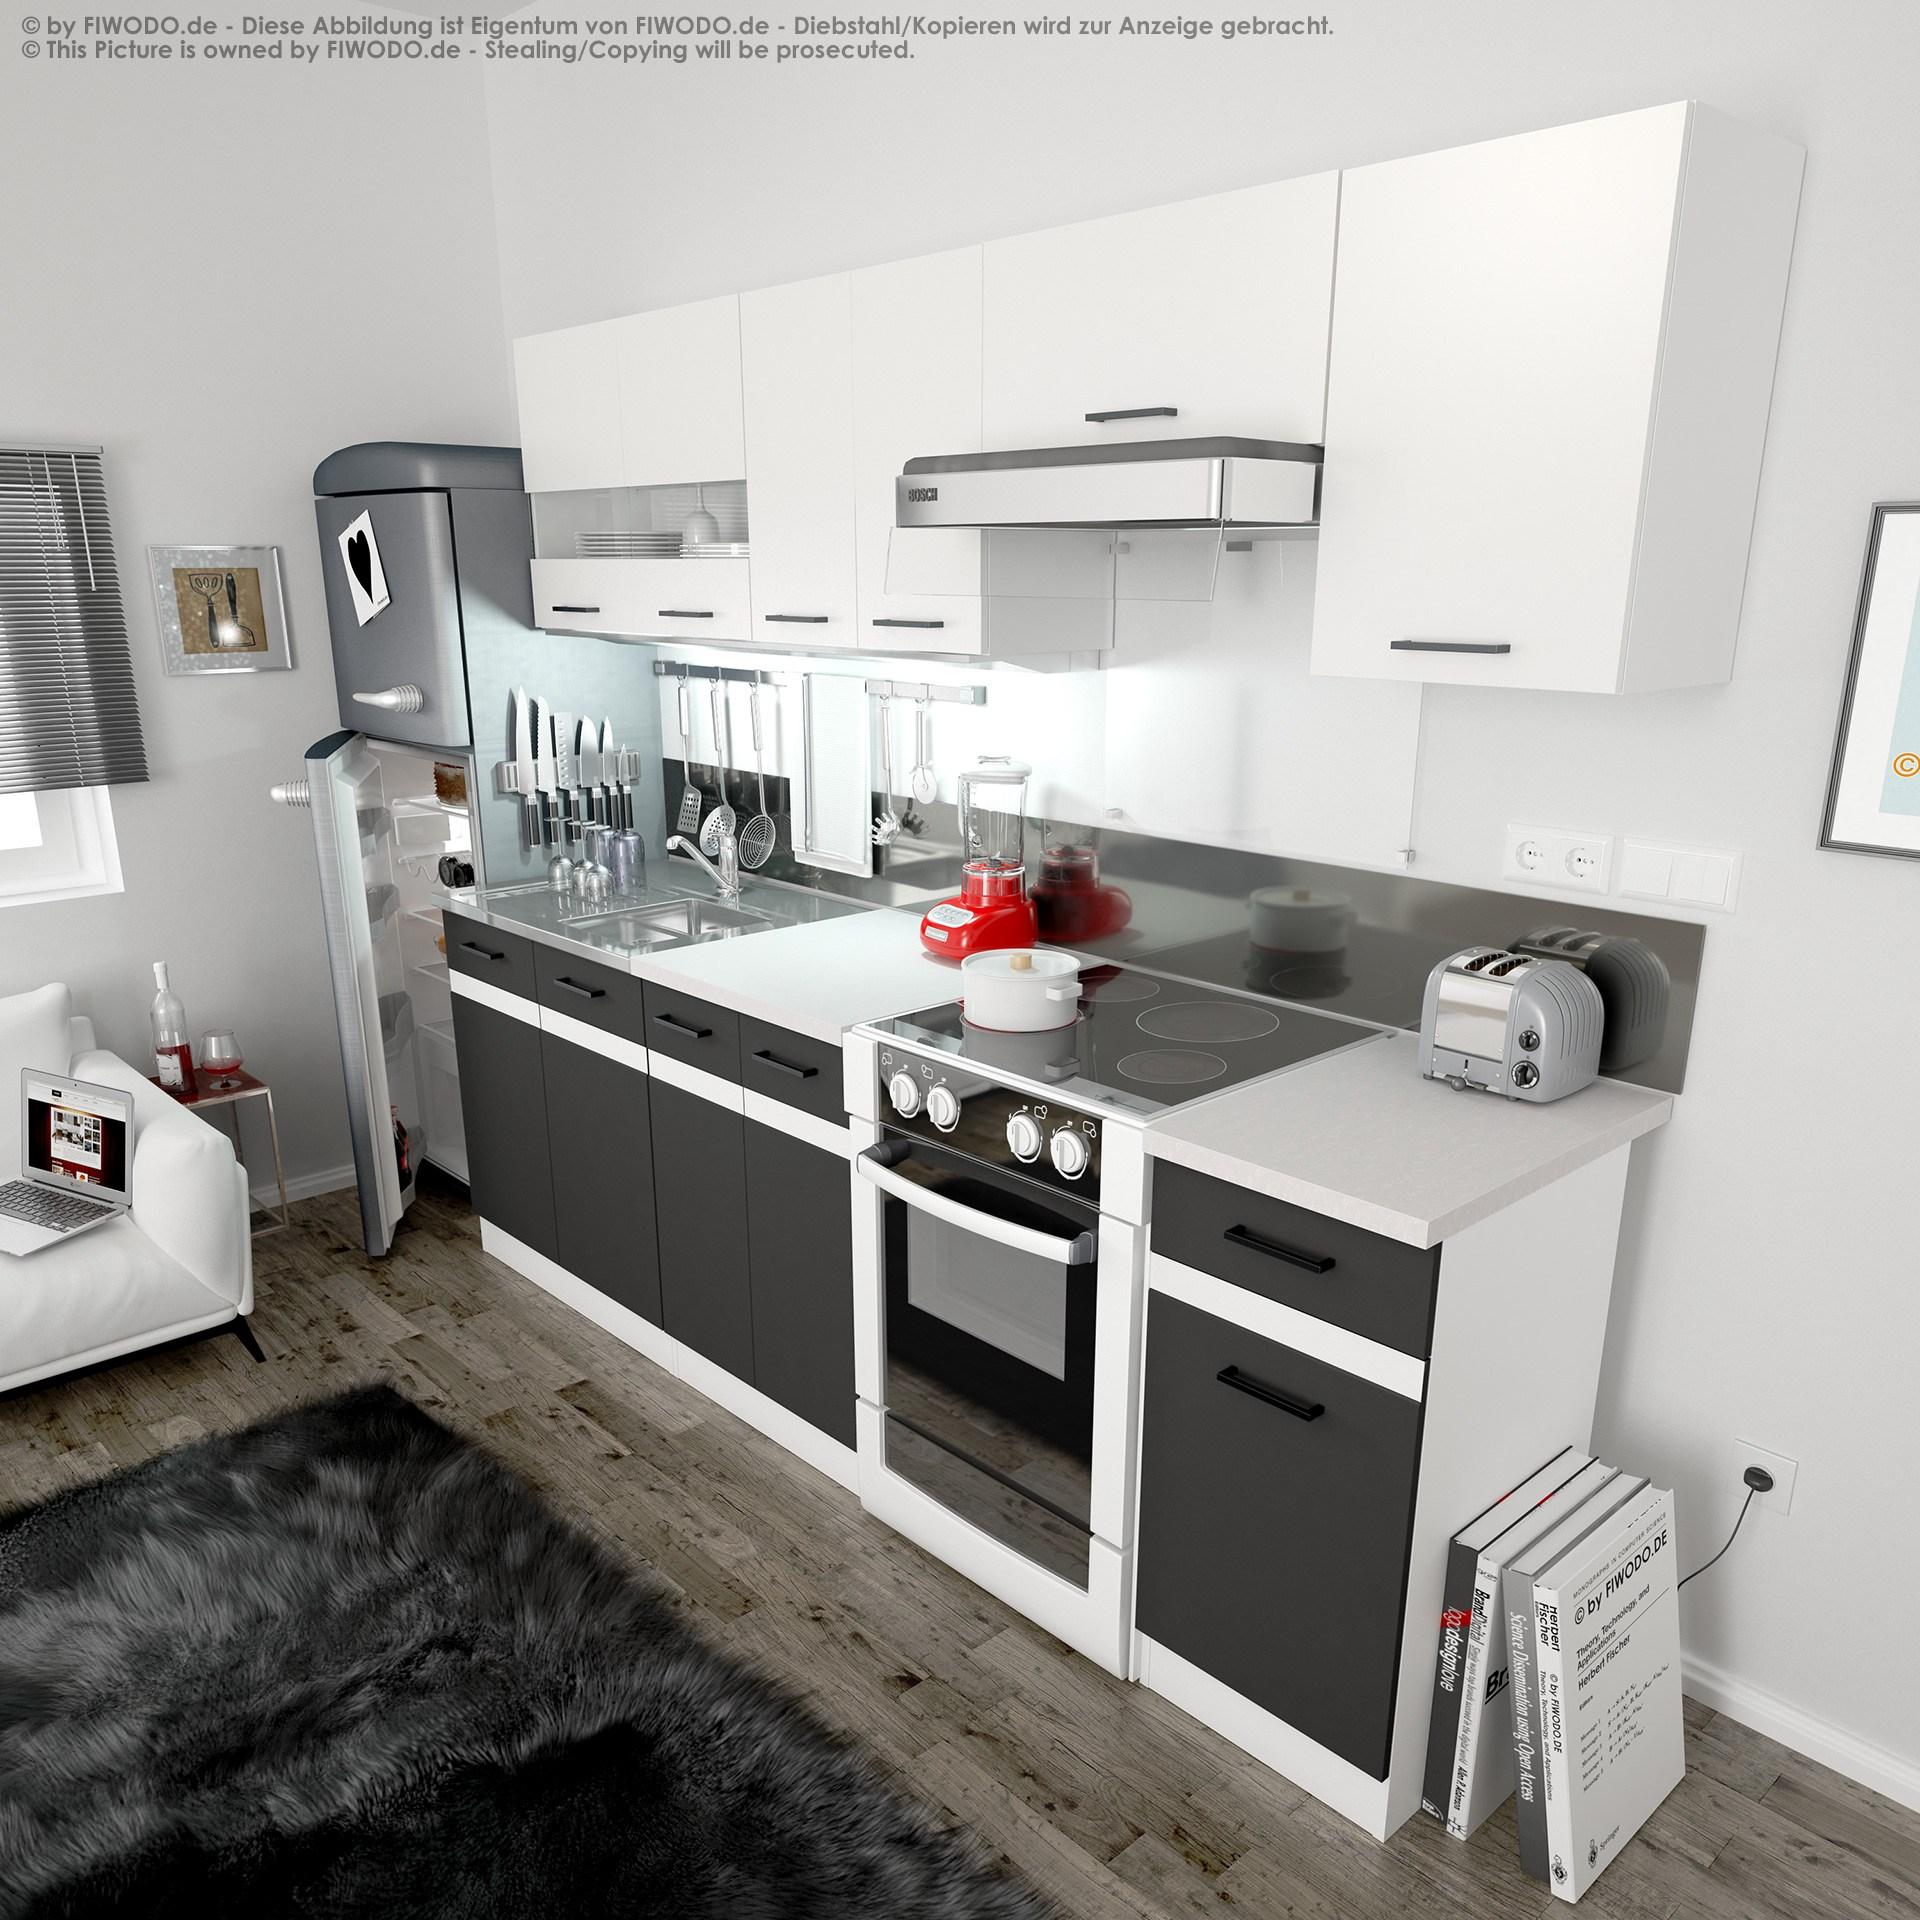 Full Size of Günstige Komplettküche Komplettküche Mit Geräten Günstig Komplettküche Kaufen Kleine Komplettküche Küche Komplettküche